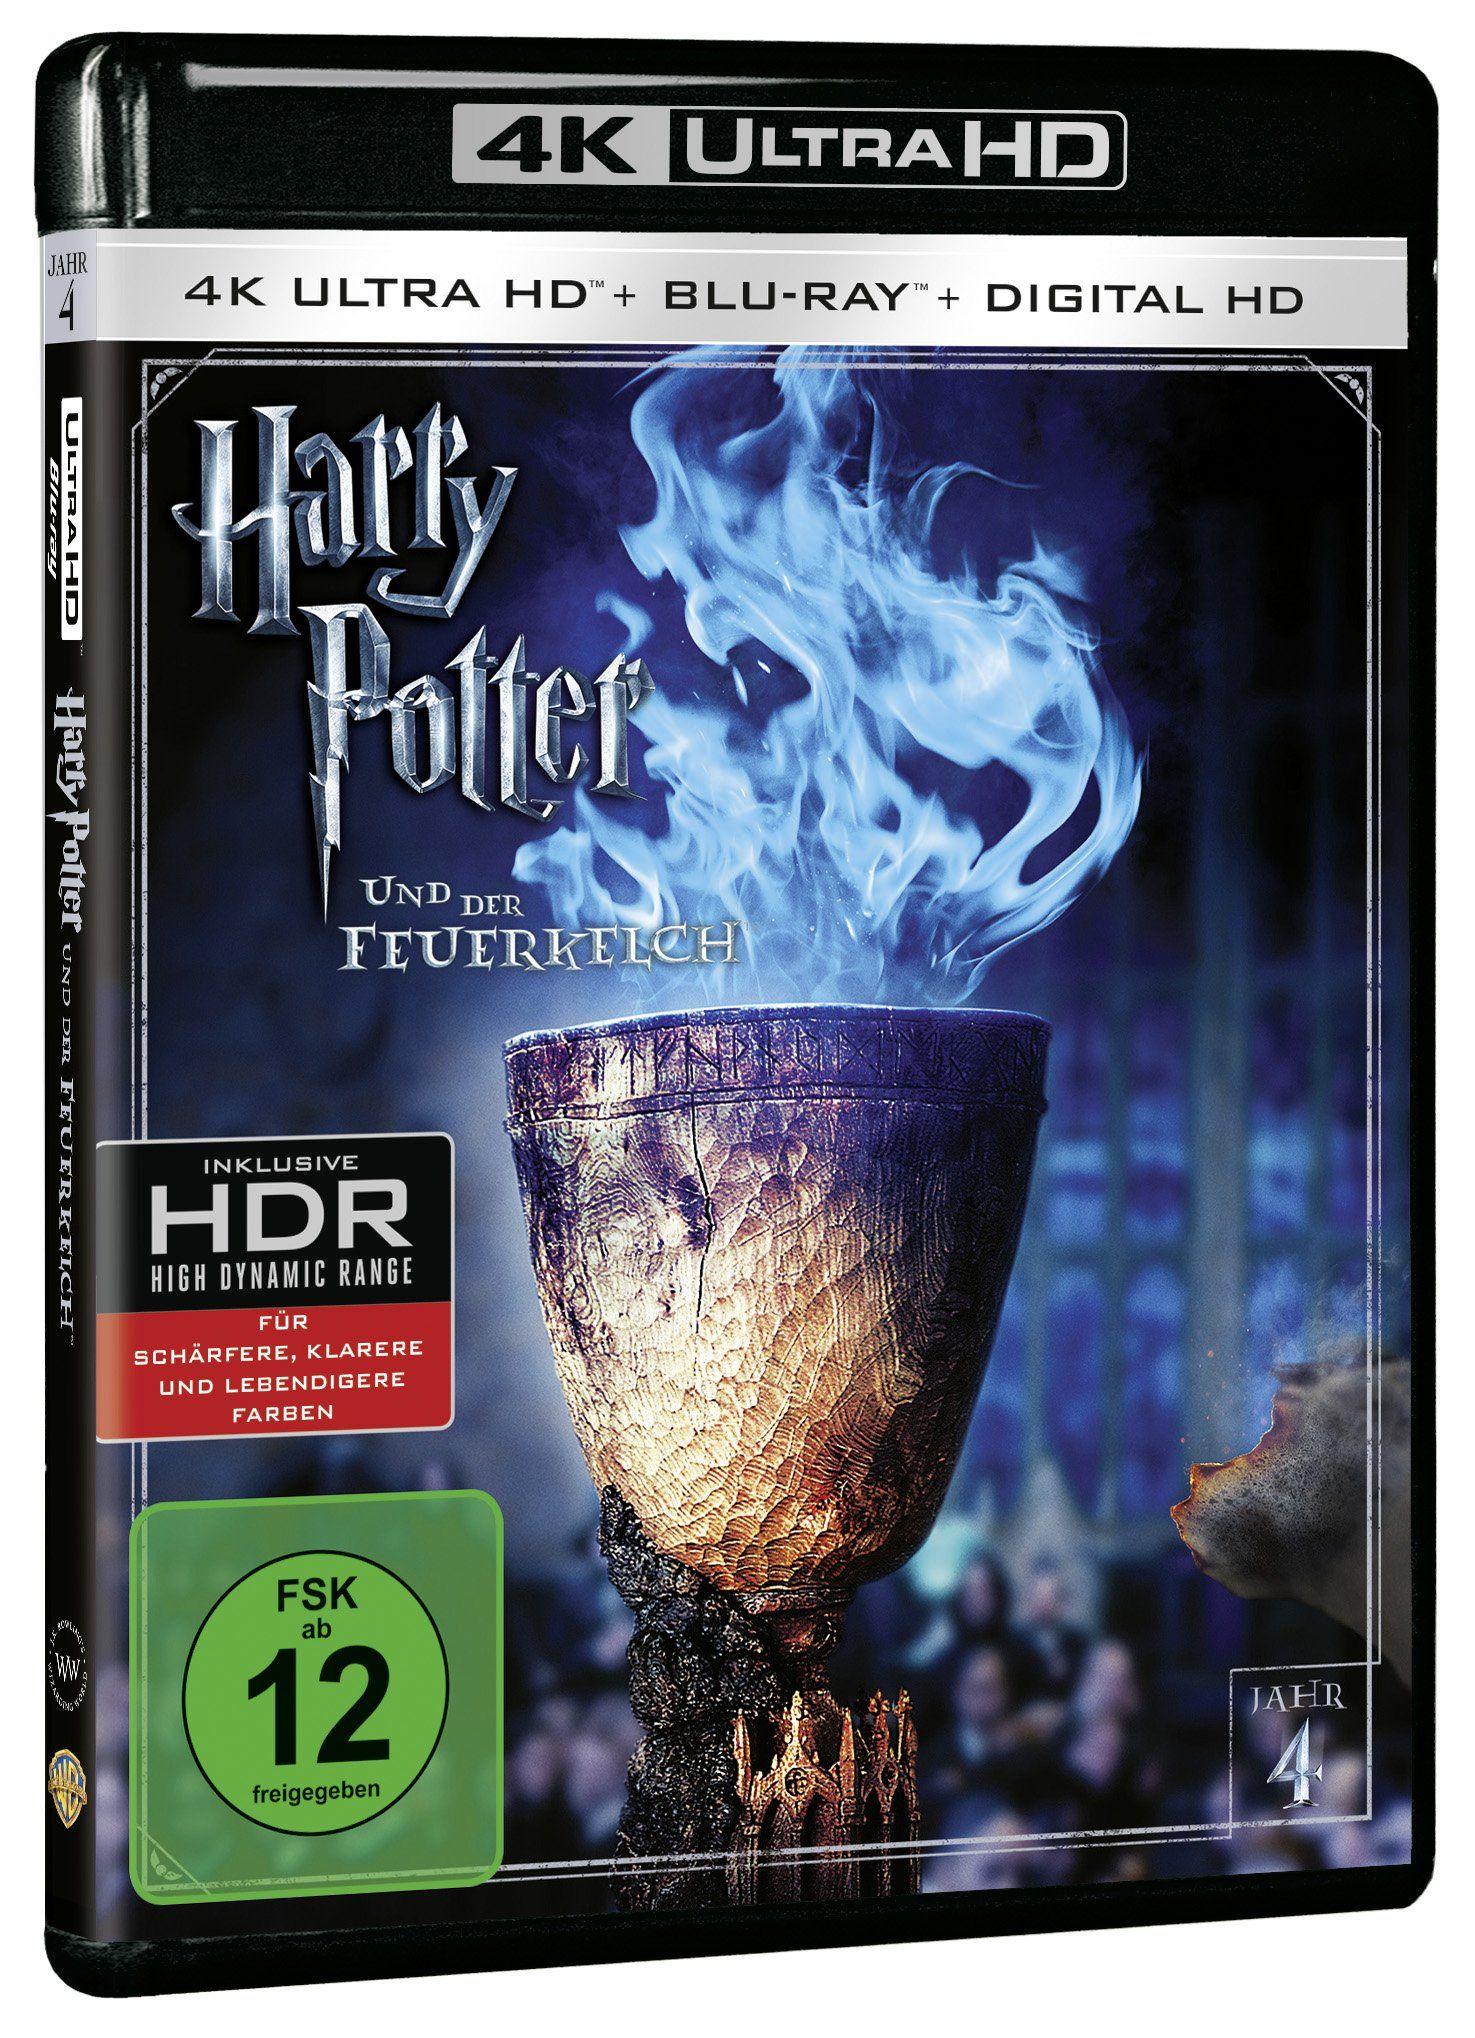 Harry Potter Und Der Feuerkelch 4k Ultra Hd Blu Ray Alemania Blu Ray Der Feuerkelch Und Harry Caliz De Fuego Harry Potter Tutorial Maquillaje Ojos